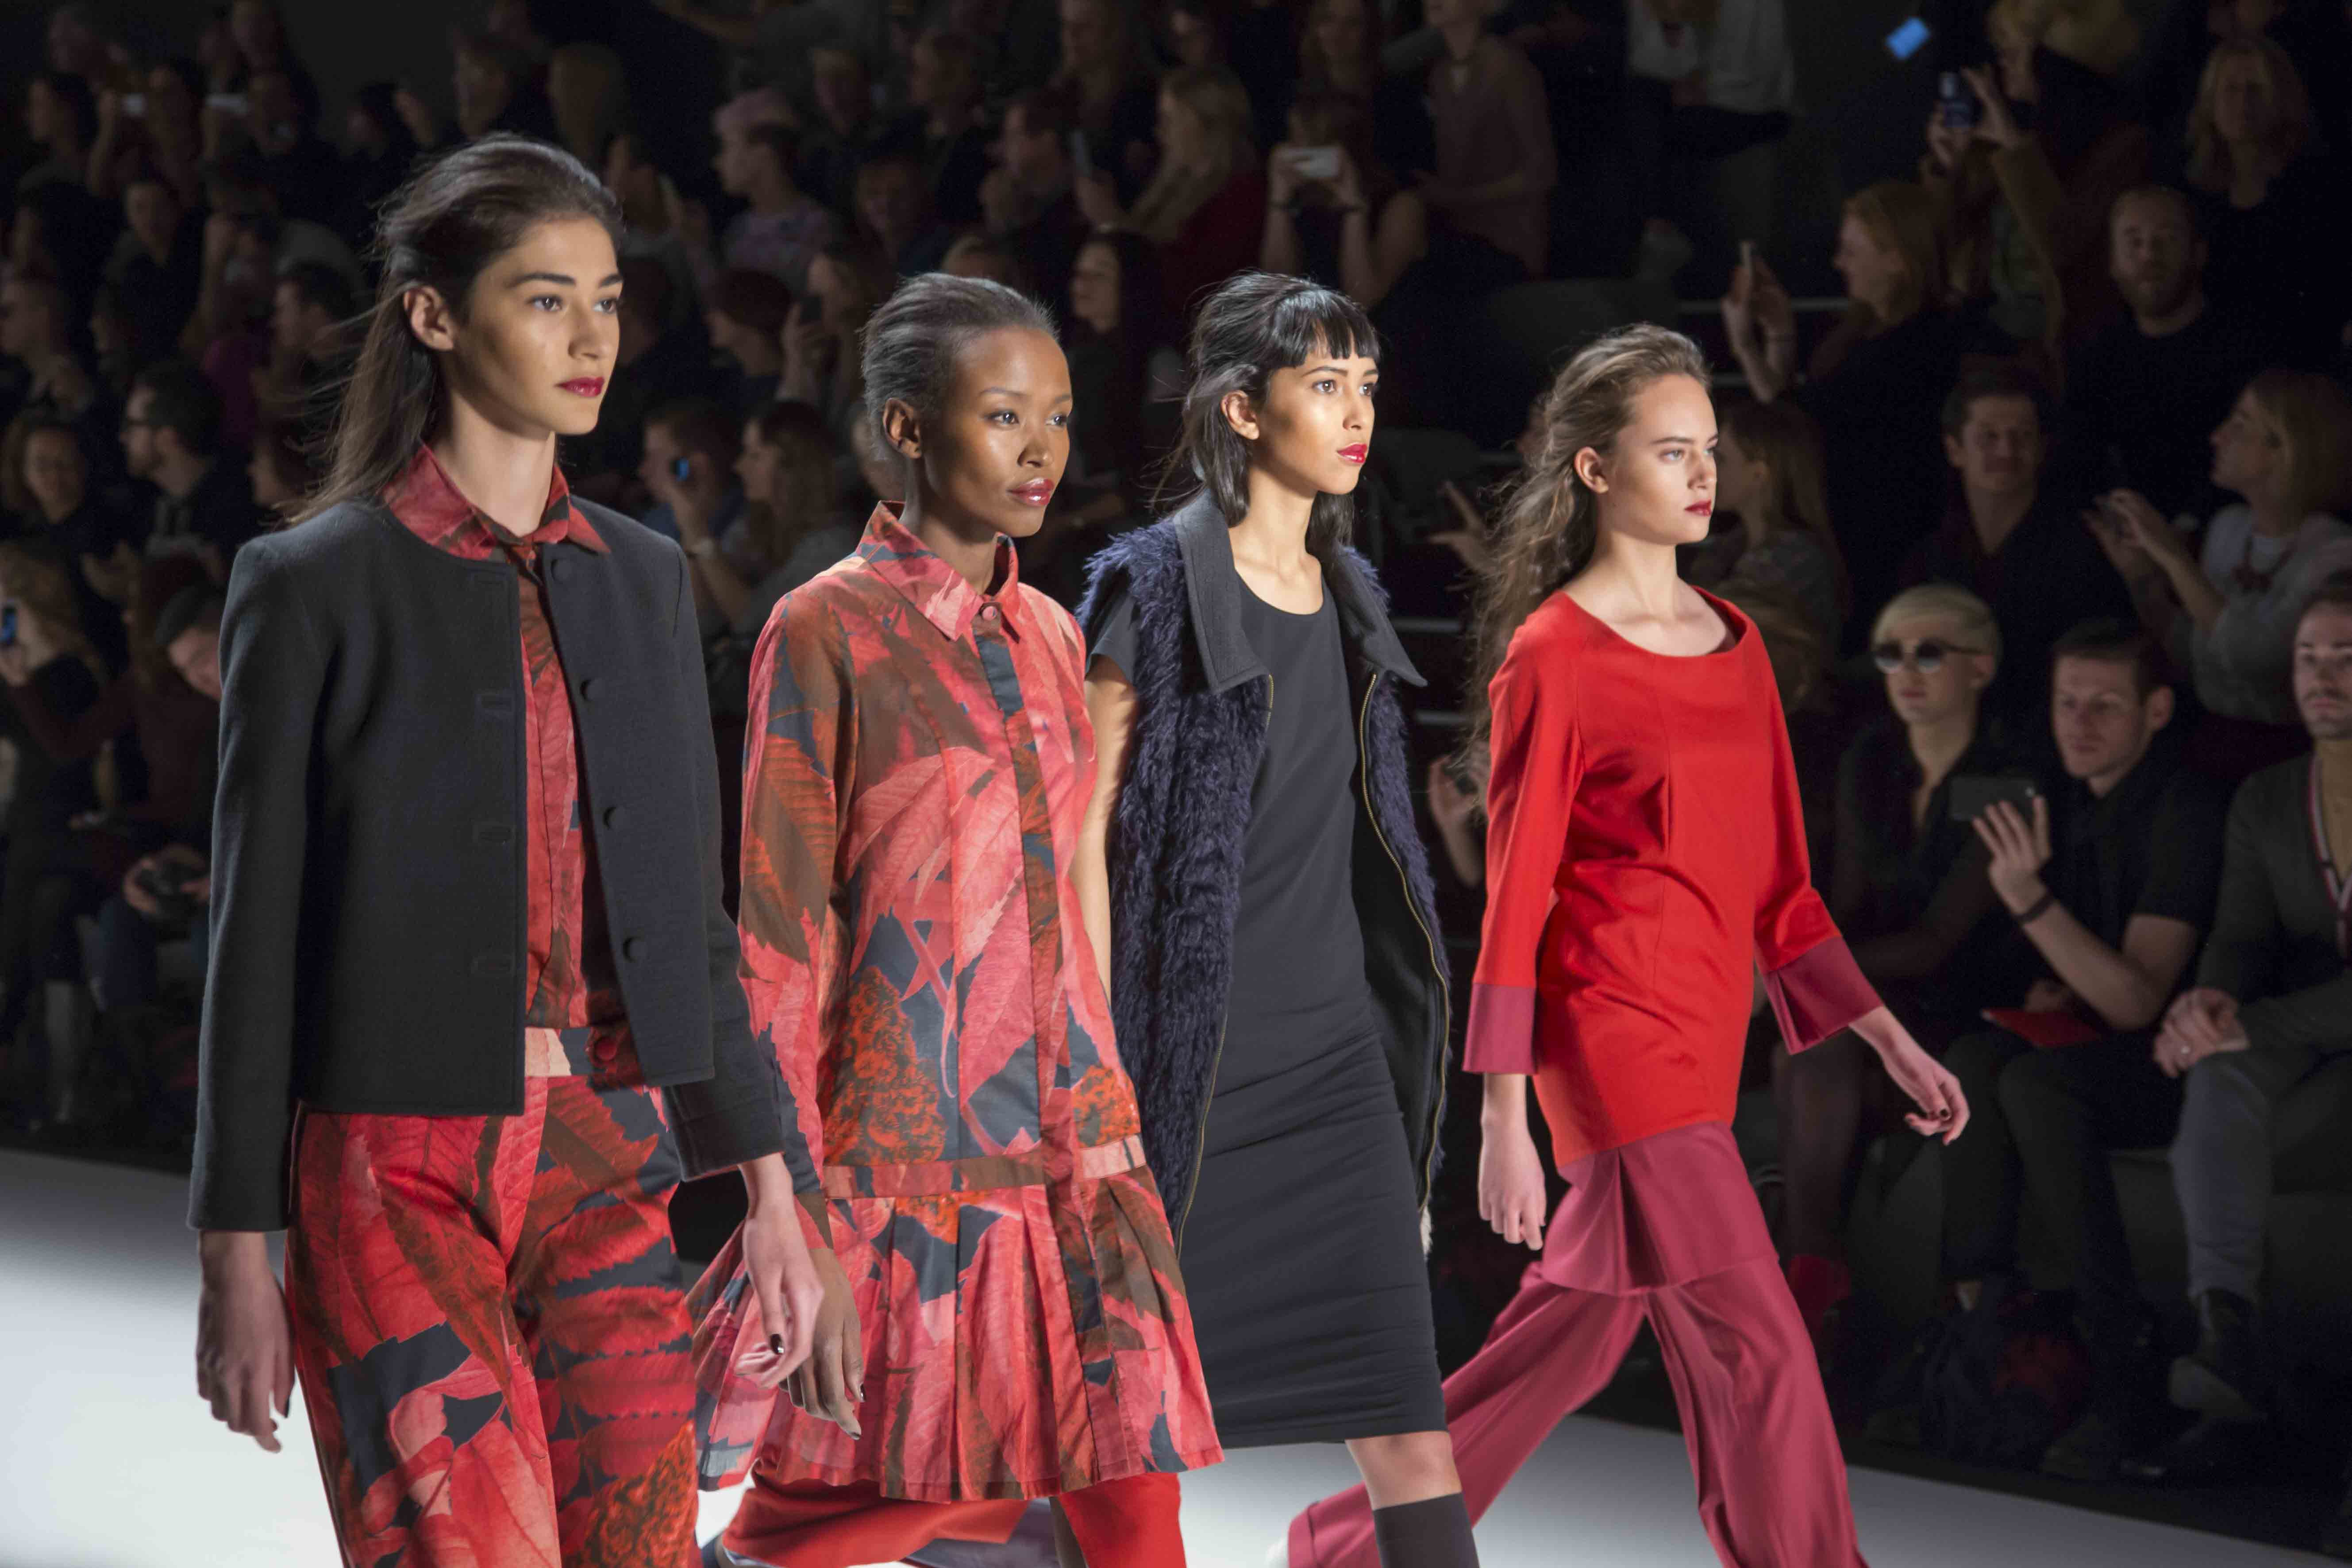 fashion week berlin - maria brussig - zalando lounge - 22012016 - 30